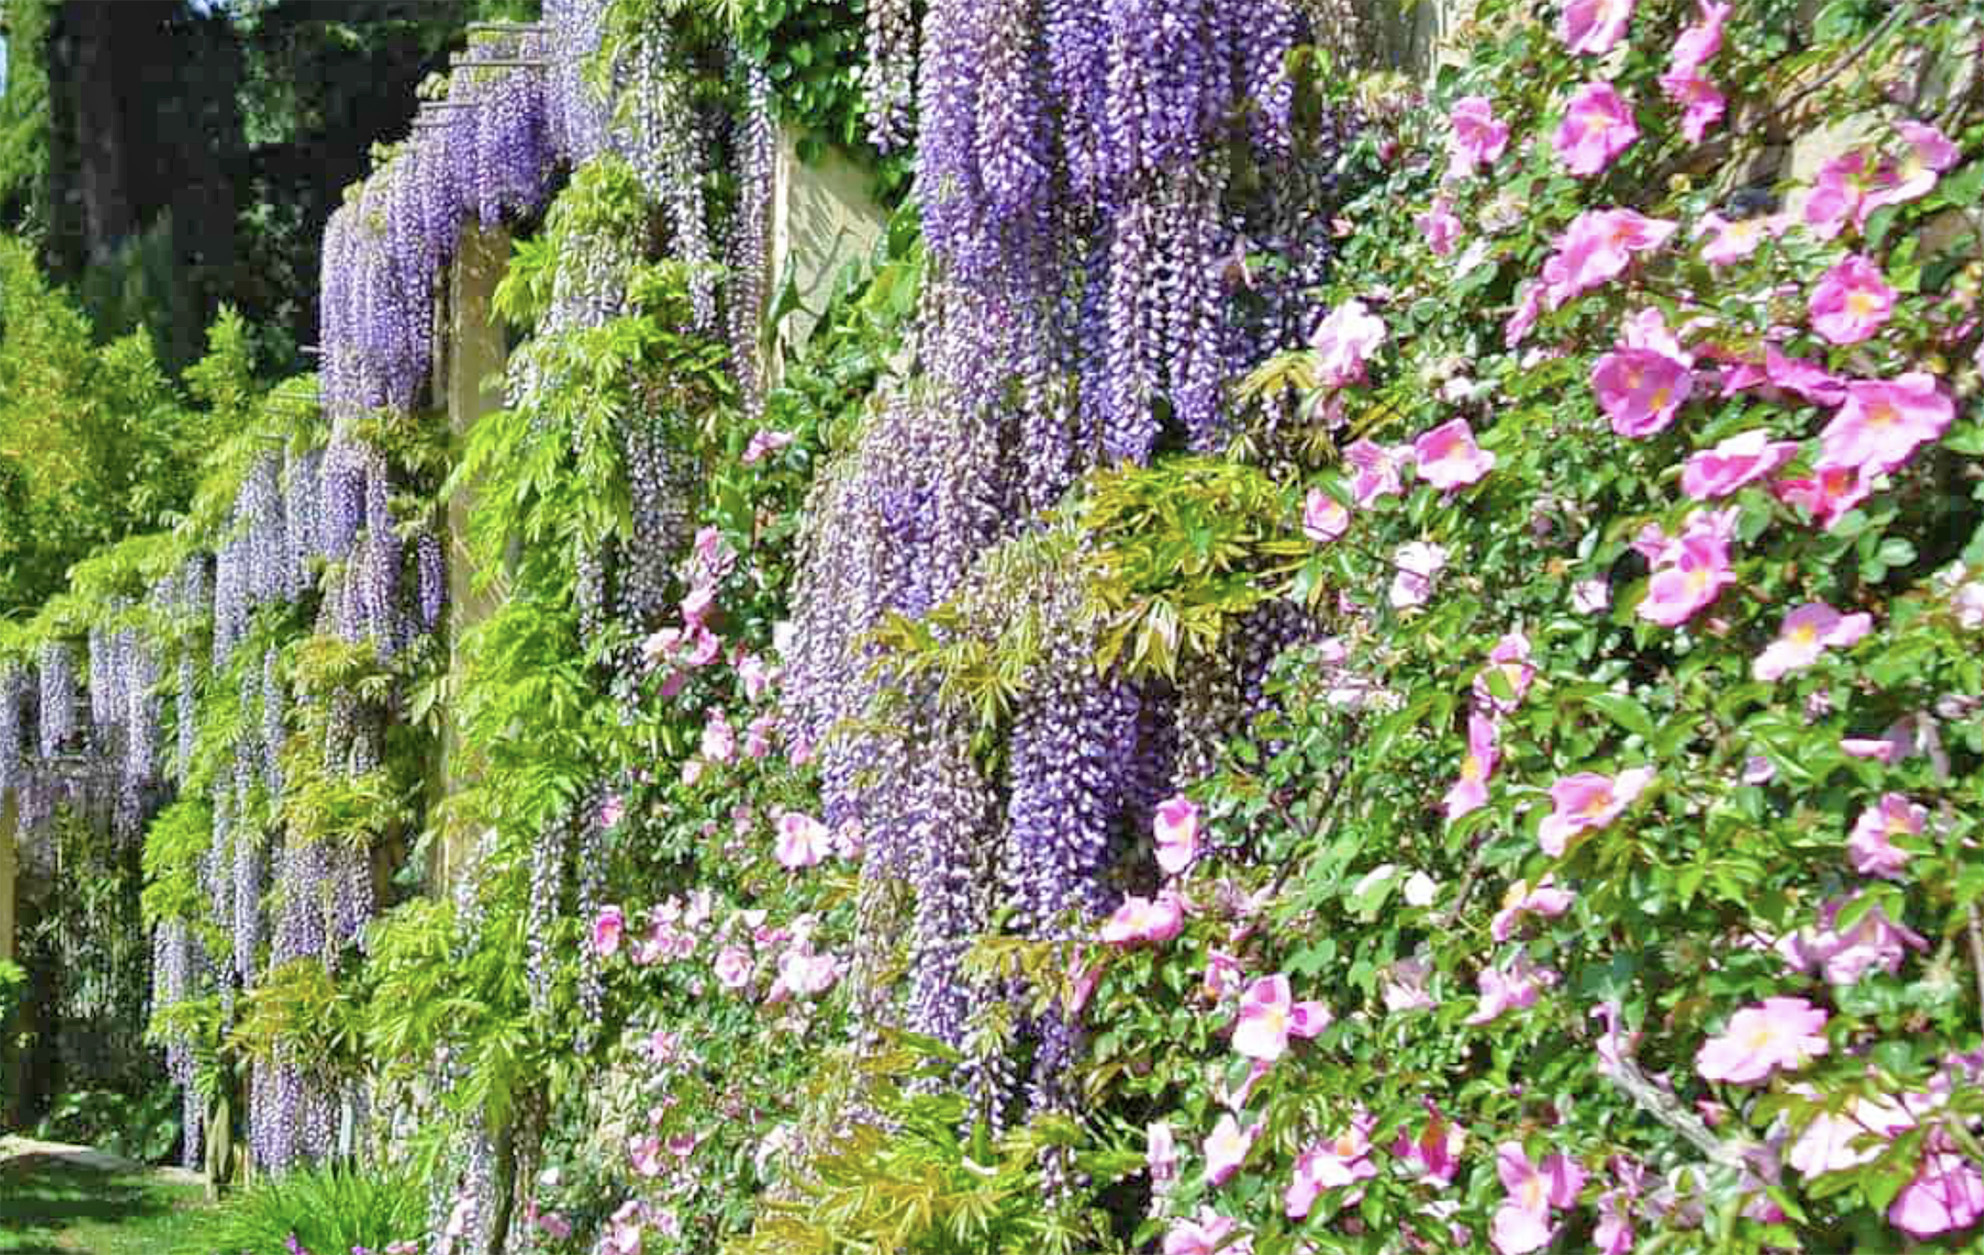 Abundance of wisteria at Alassio